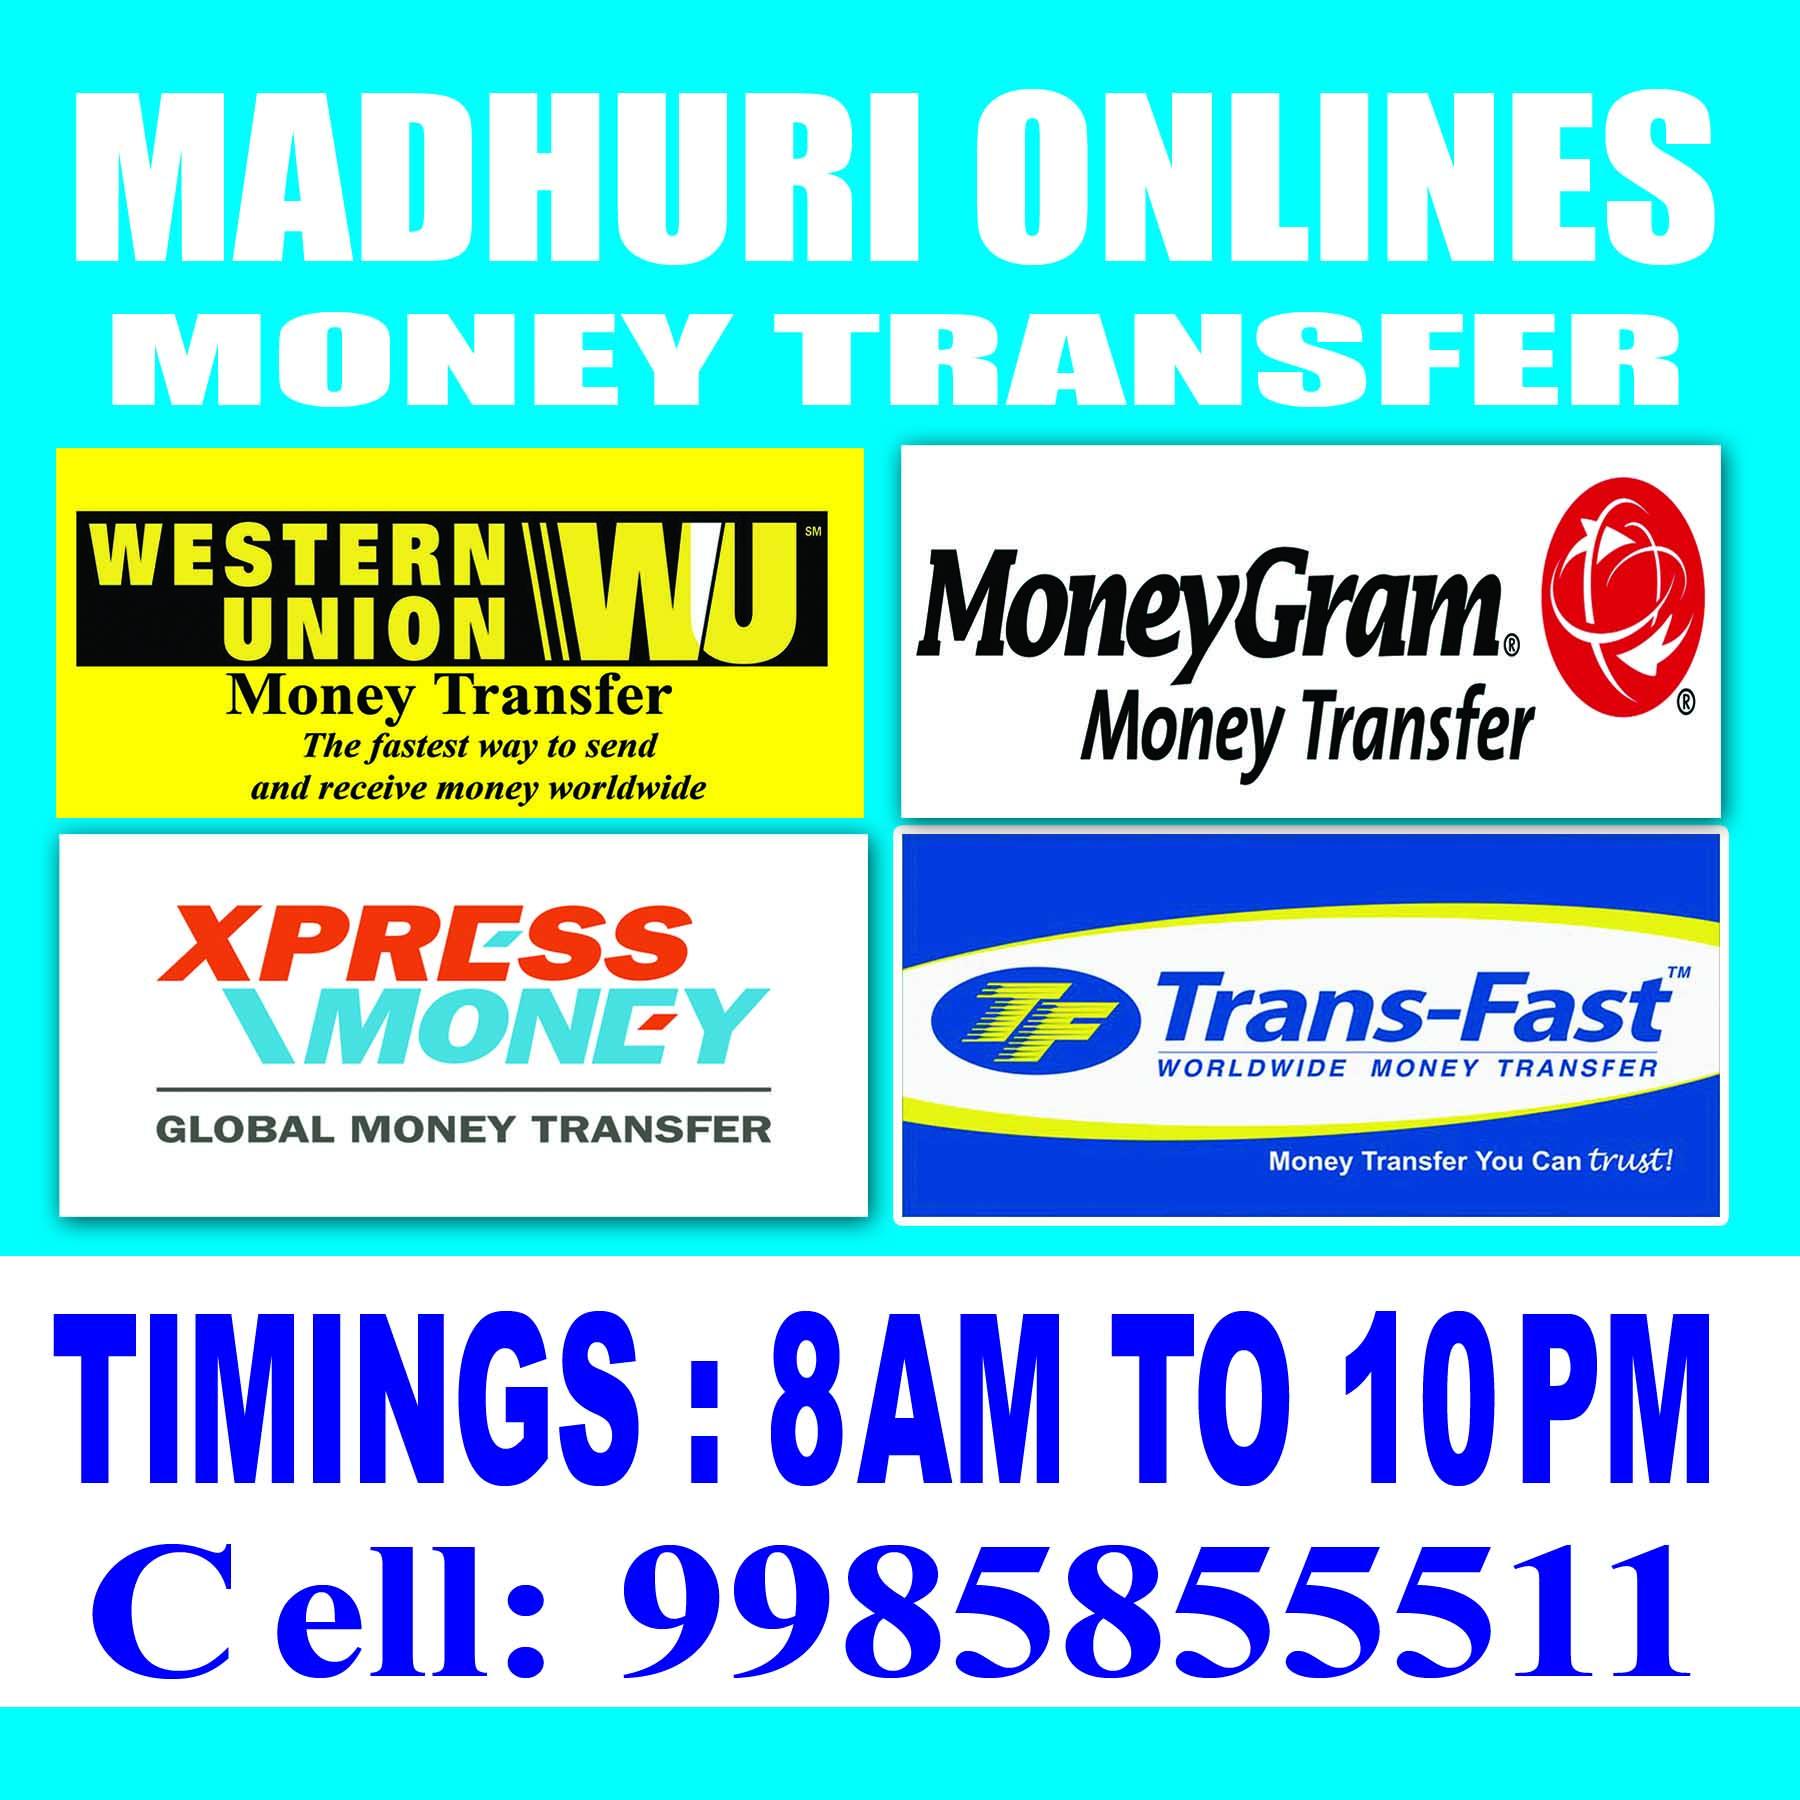 MADHURI ONLINES - logo